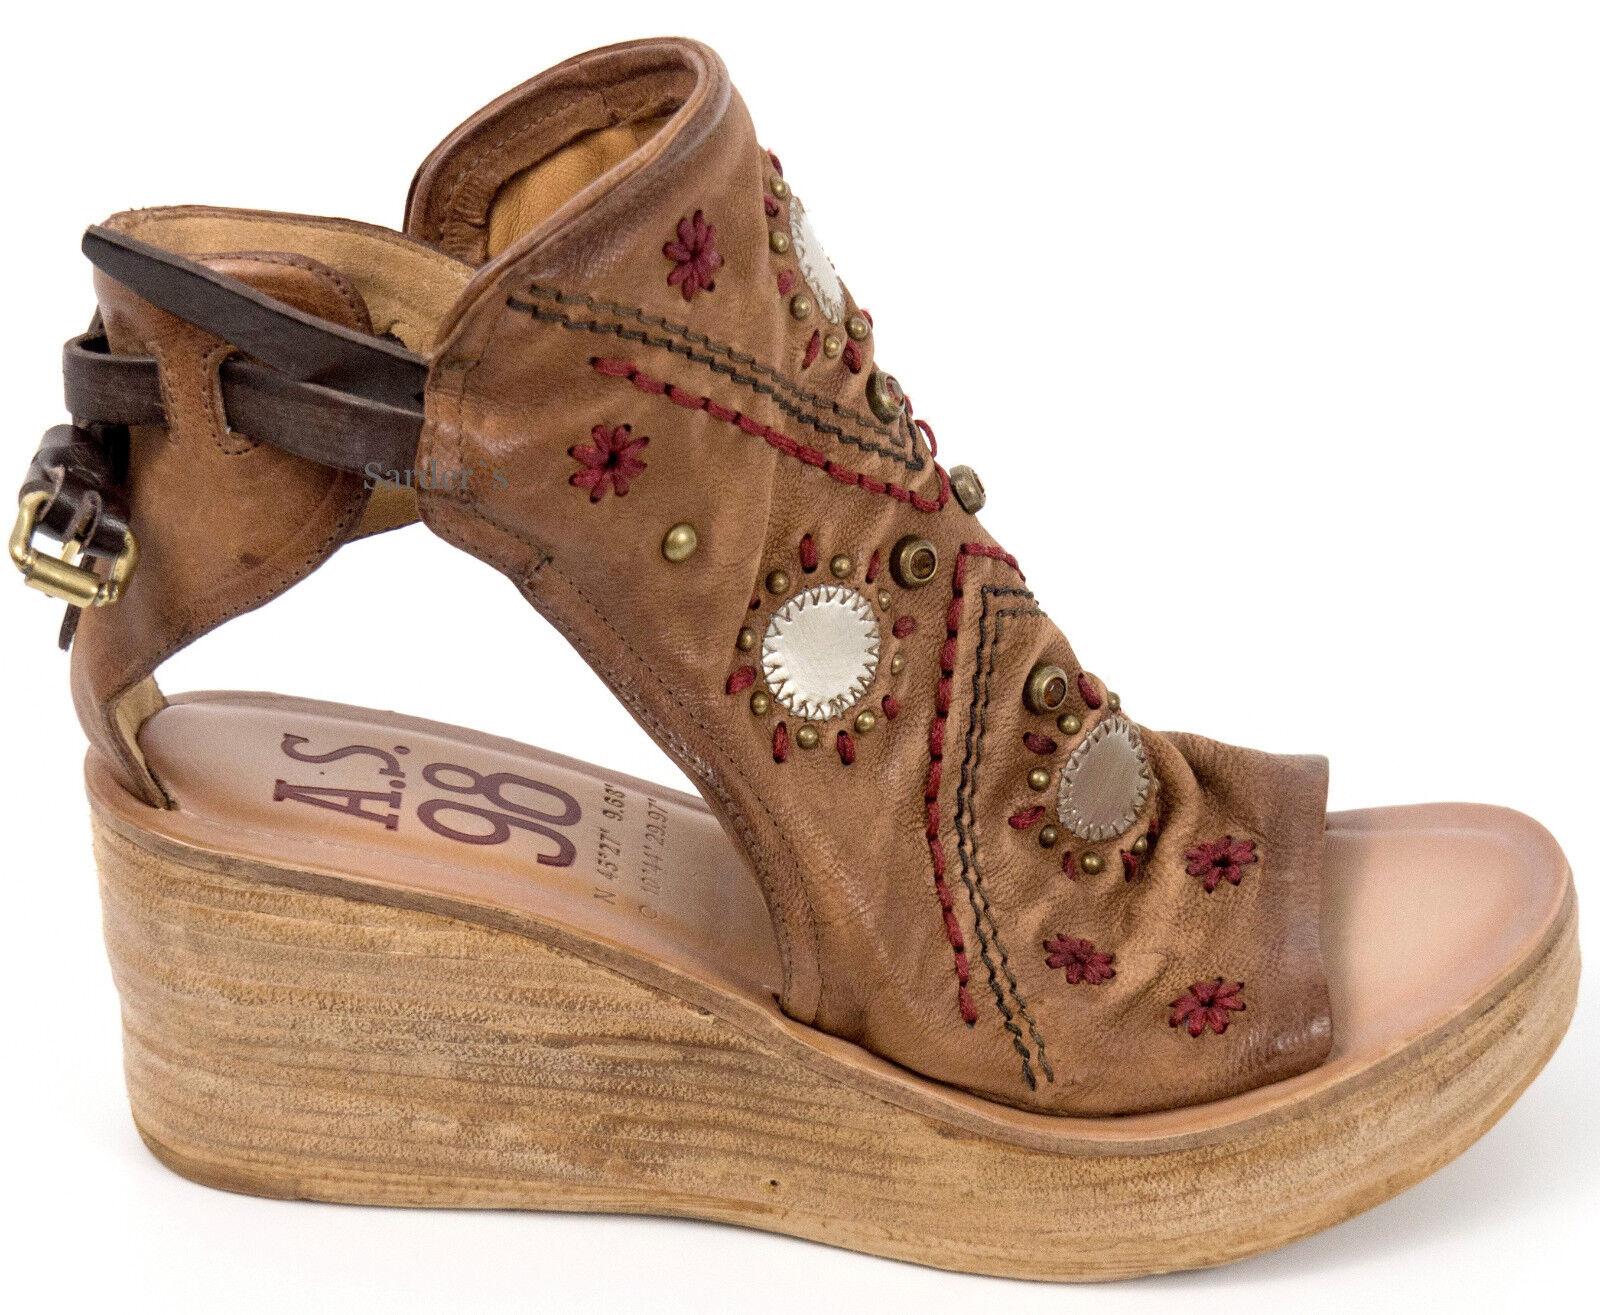 AIRSTEP A.S.98 Italy Sandalette 42 LEDER Schuh Cognac Braun Keil Plateau Top Neu